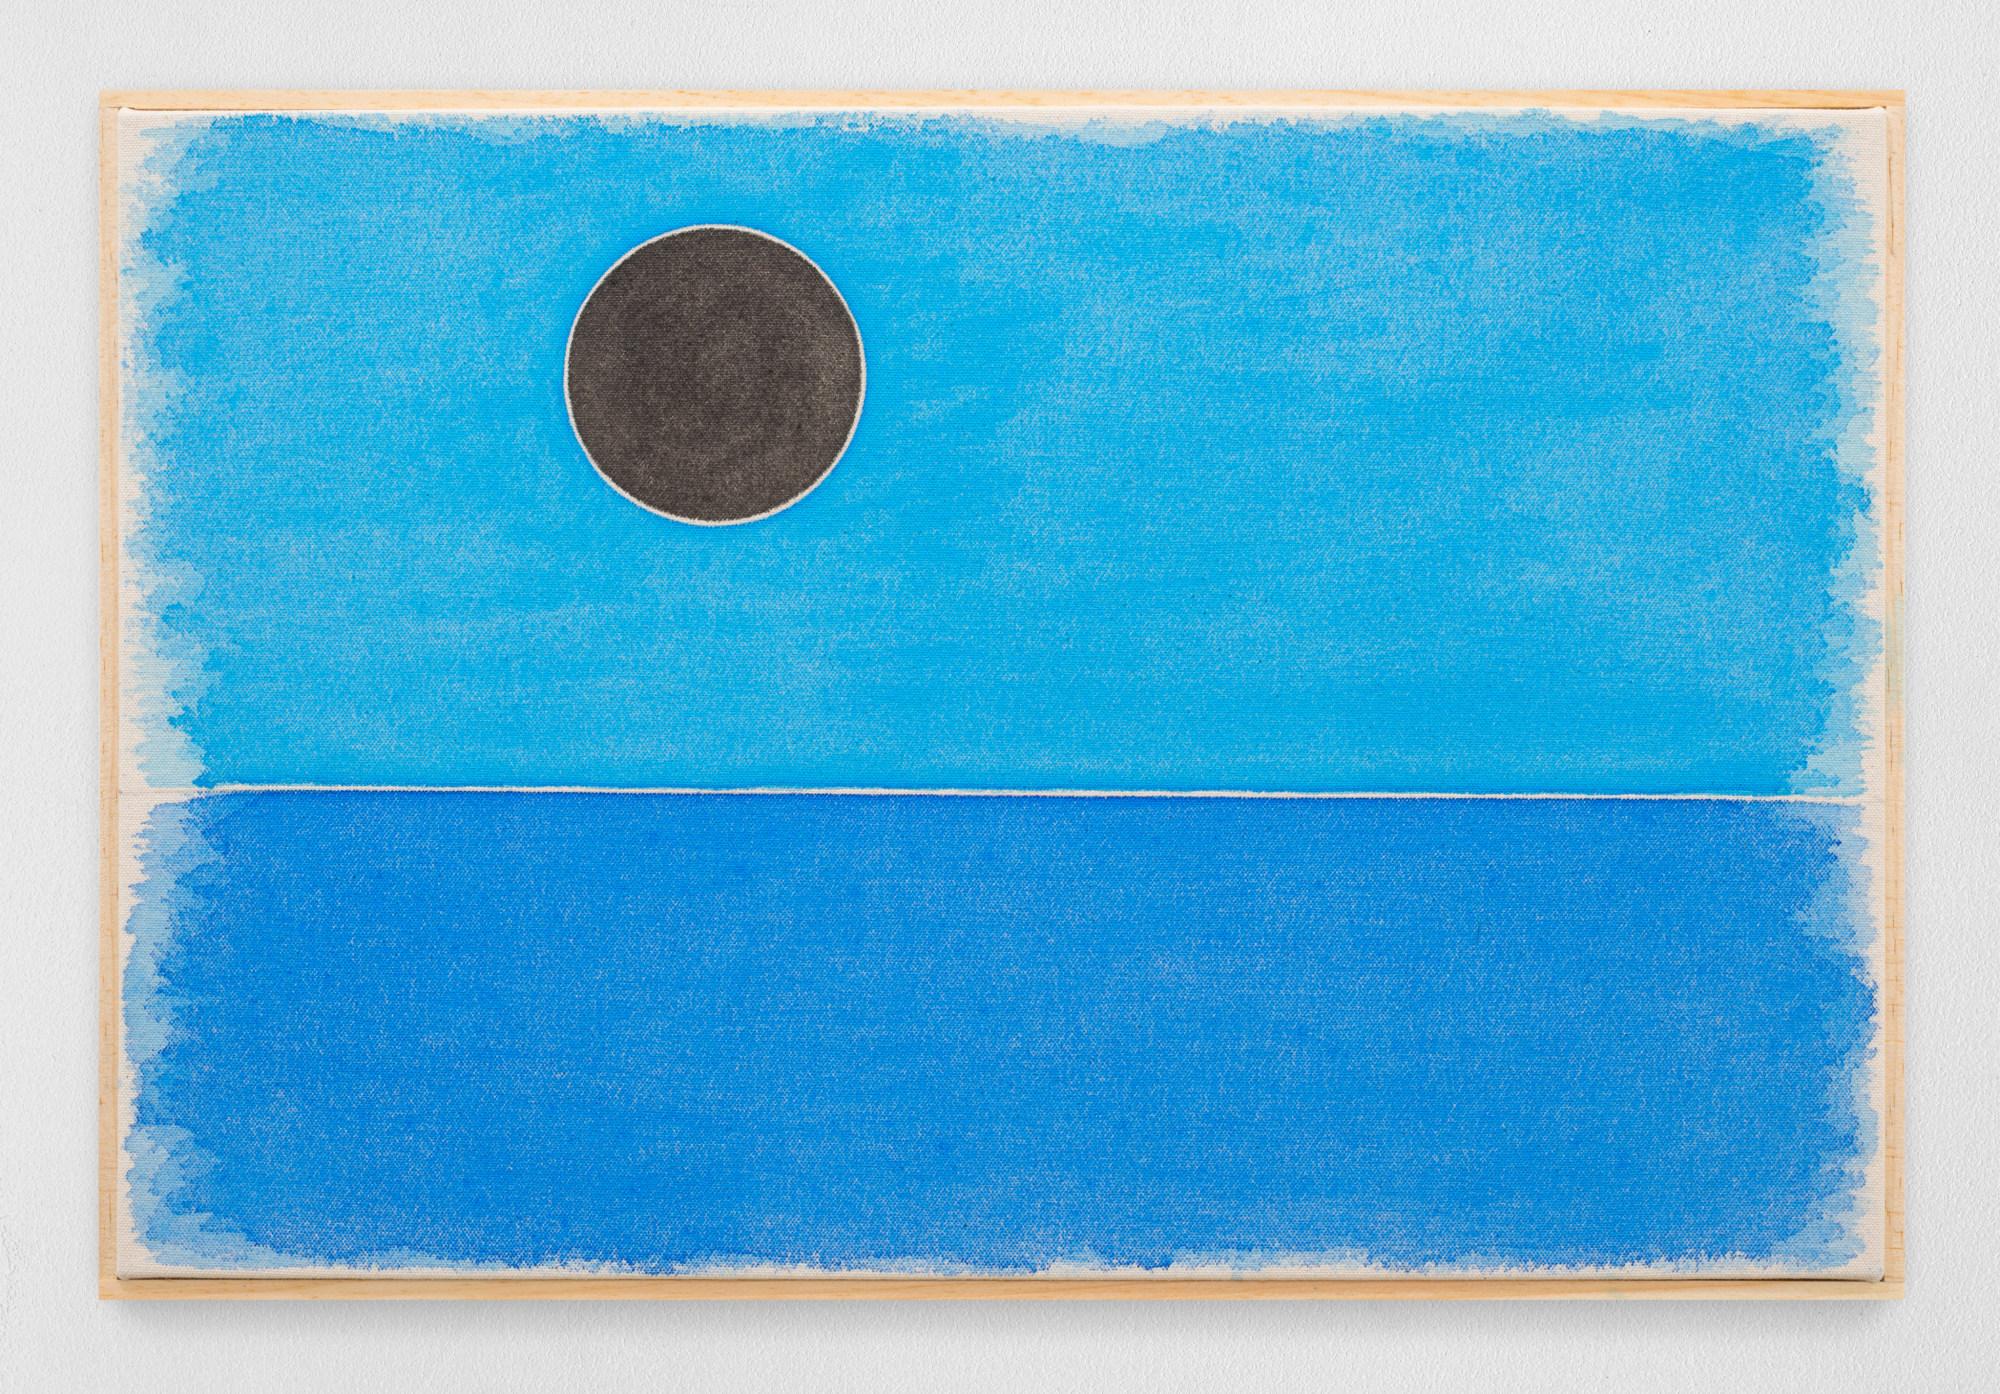 "<div class=""artwork_caption""><div class=""title""><em>dreißigsterjanuarzweitausendundeinundzwanzig</em>, 2021</div><div class=""medium"">watercolour on canvas, artist's frame</div><div class=""dimensions"">site size: 35.5 x 53.2 x 2.2 cm / 14 x 21 x 7/8 in<br />frame size: 37 x 54.5 x 2.5 cm / 14 5/8 x 21 1/2 x 1 in</div></div><div class=""link""><span class=""website_contact_form"" data-contact-form-details=""dreißigsterjanuarzweitausendundeinundzwanzig, 2021  watercolour on canvas, artist's frame  site size: 35.5 x 53.2 x 2.2 cm / 14 x 21 x 7/8 in frame size: 37 x 54.5 x 2.5 cm / 14 5/8 x 21 1/2 x 1 in"" data-contact-form-image=""https://artlogic-res.cloudinary.com/w_200,h_200,c_fill,f_auto,fl_lossy/ws-sadiecoles/usr/exhibitions/images/exhibitions/852/hq24-ur17198p-image.jpg"">Enquire</span></div>"